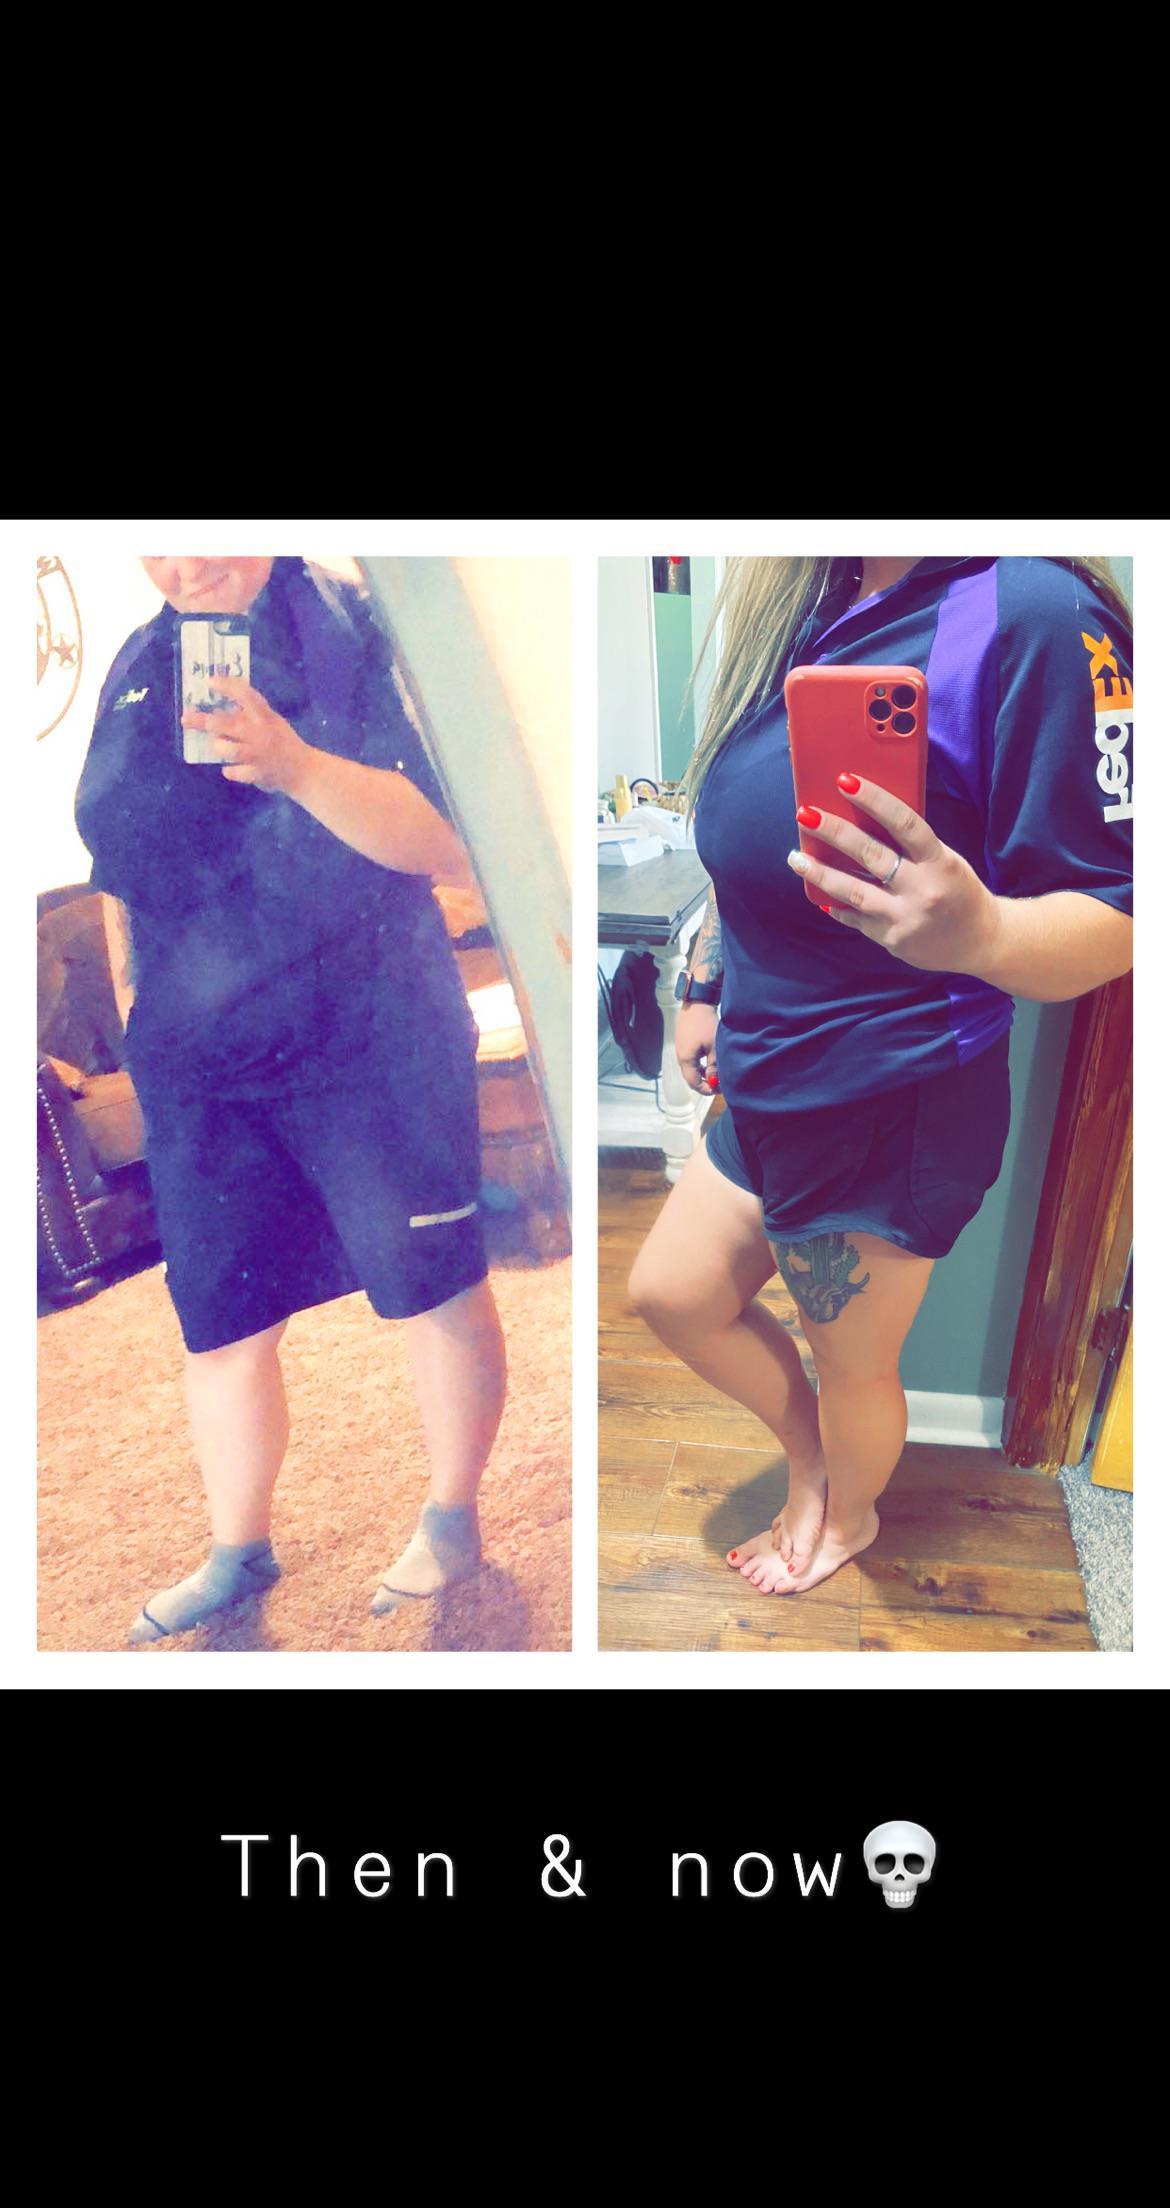 Progress Pics of 45 lbs Weight Loss 5 feet 2 Female 230 lbs to 185 lbs